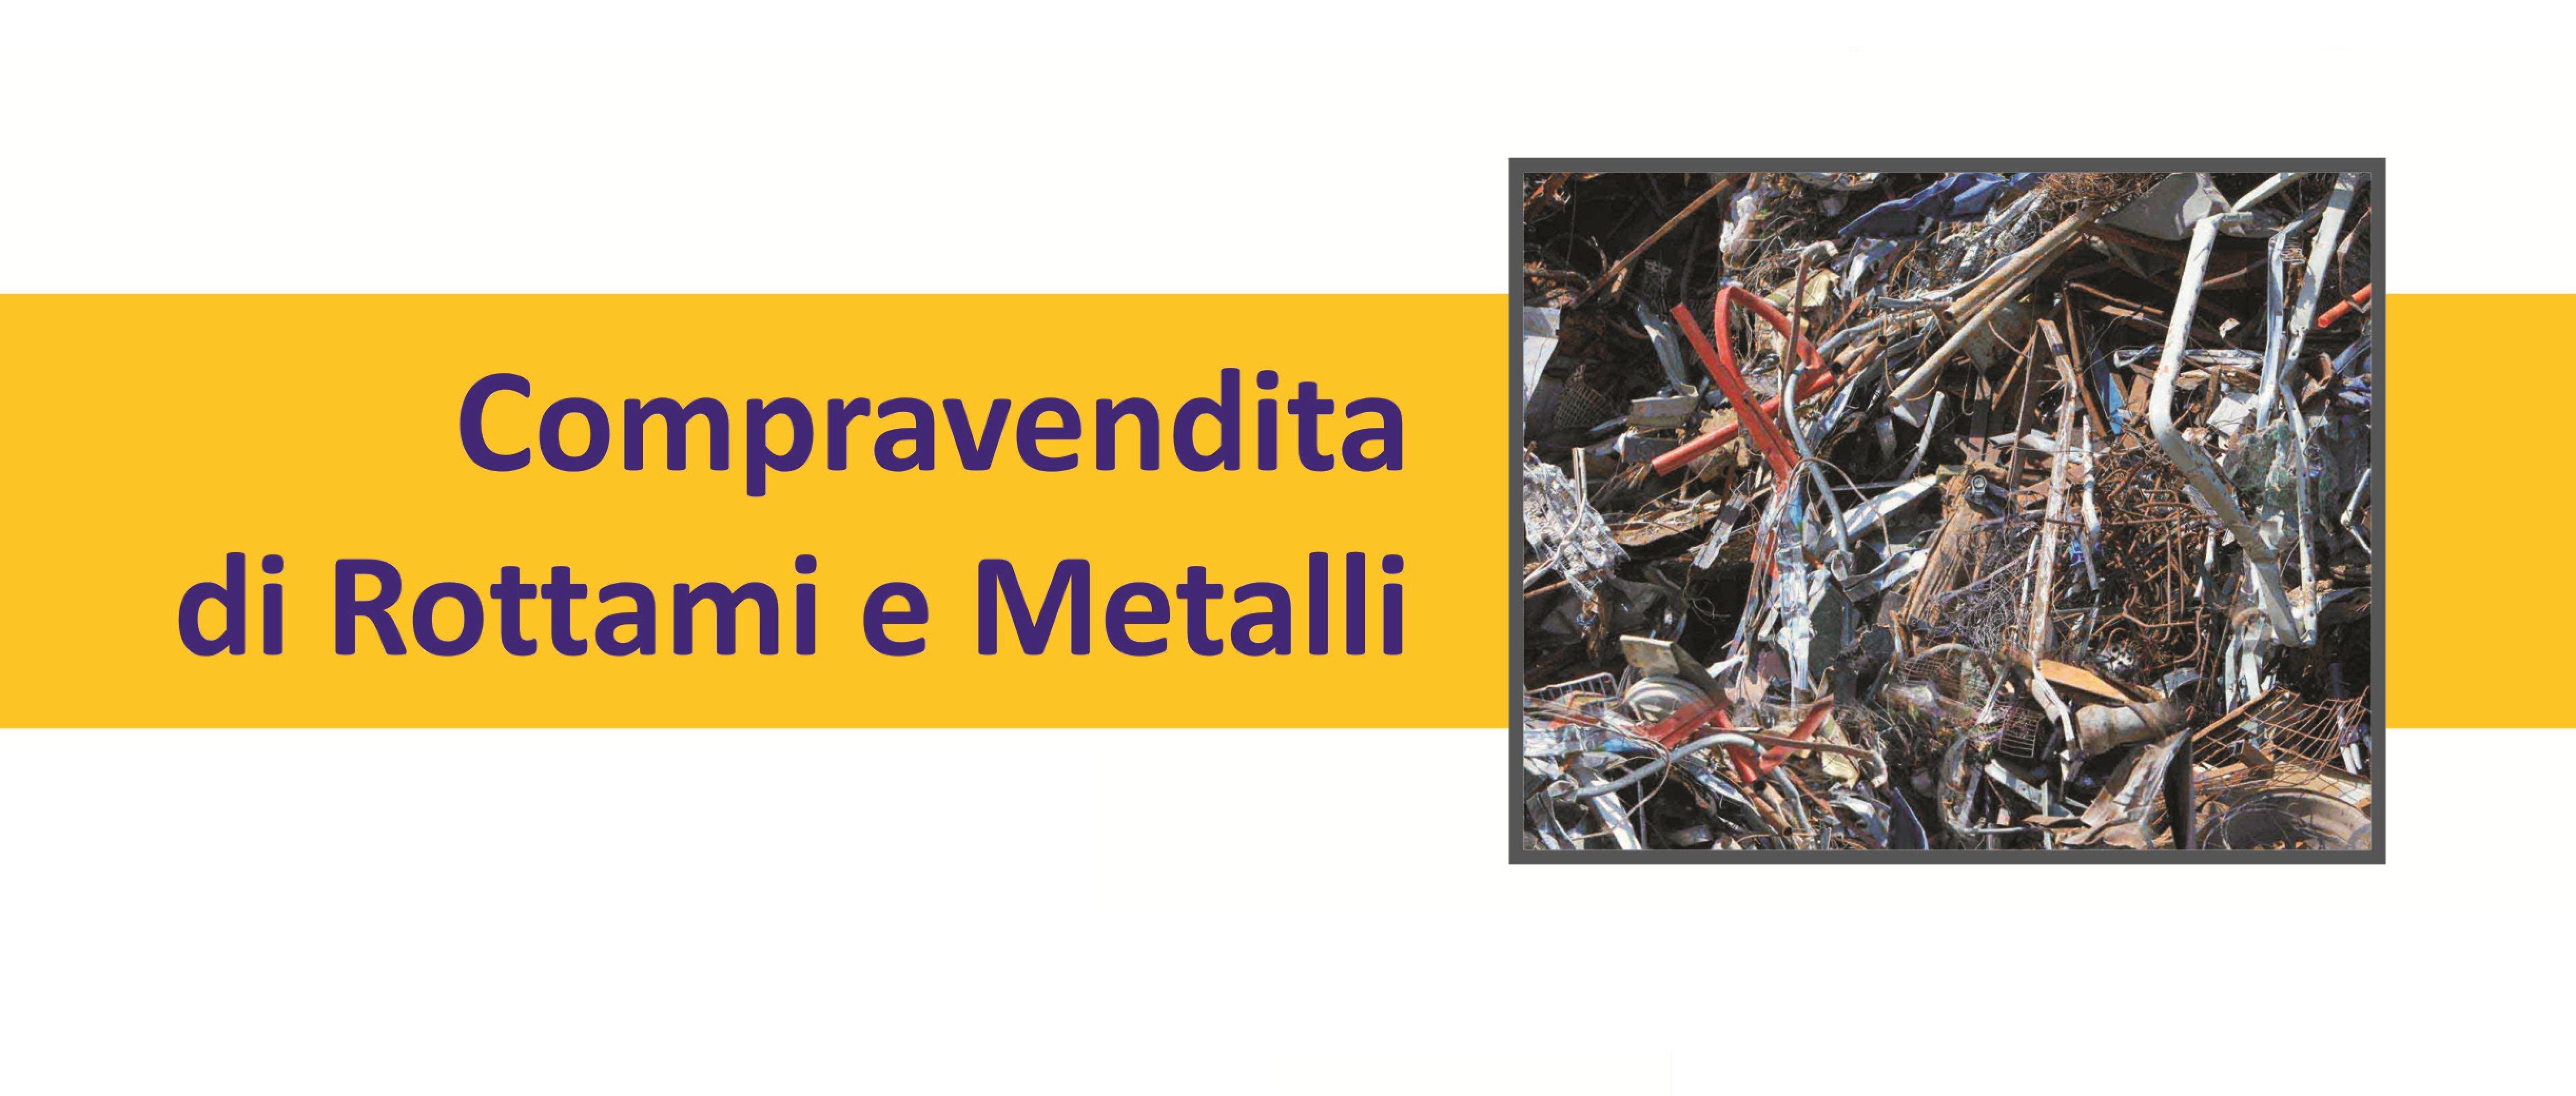 compravendita di rottami e metalli